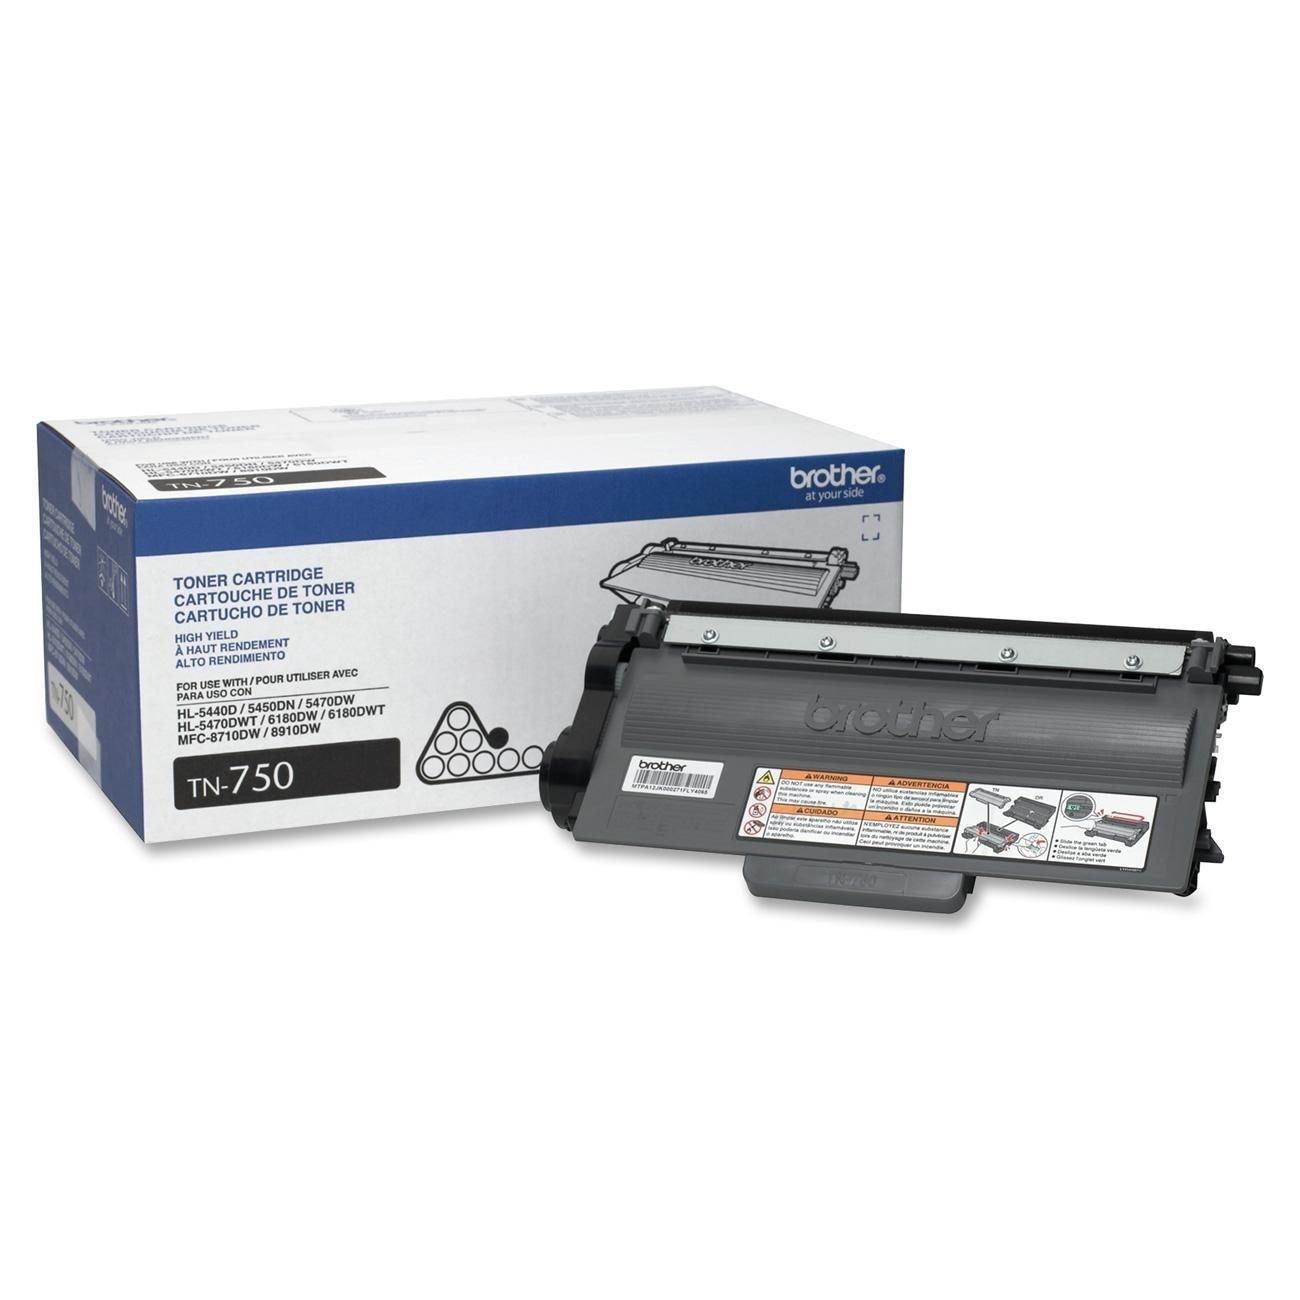 Brother-TN-750-OEM-Toner-Cartridge